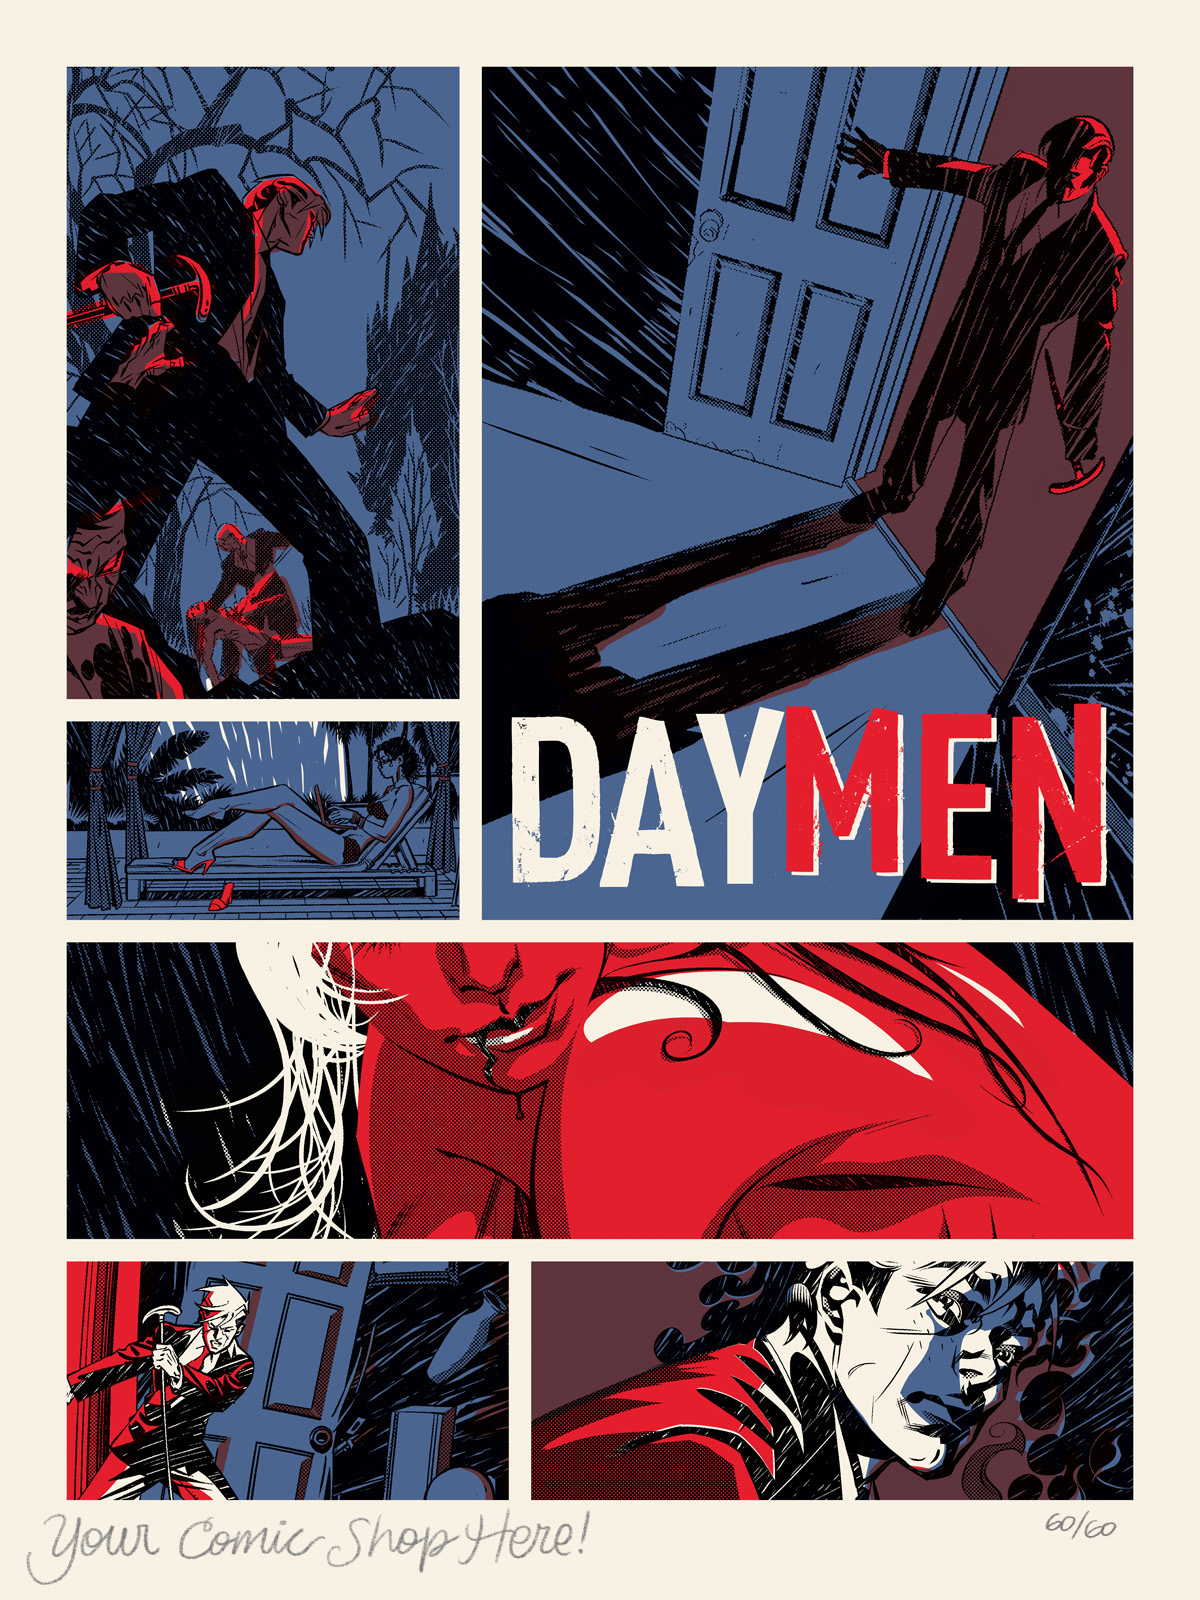 Day Men Promo Print